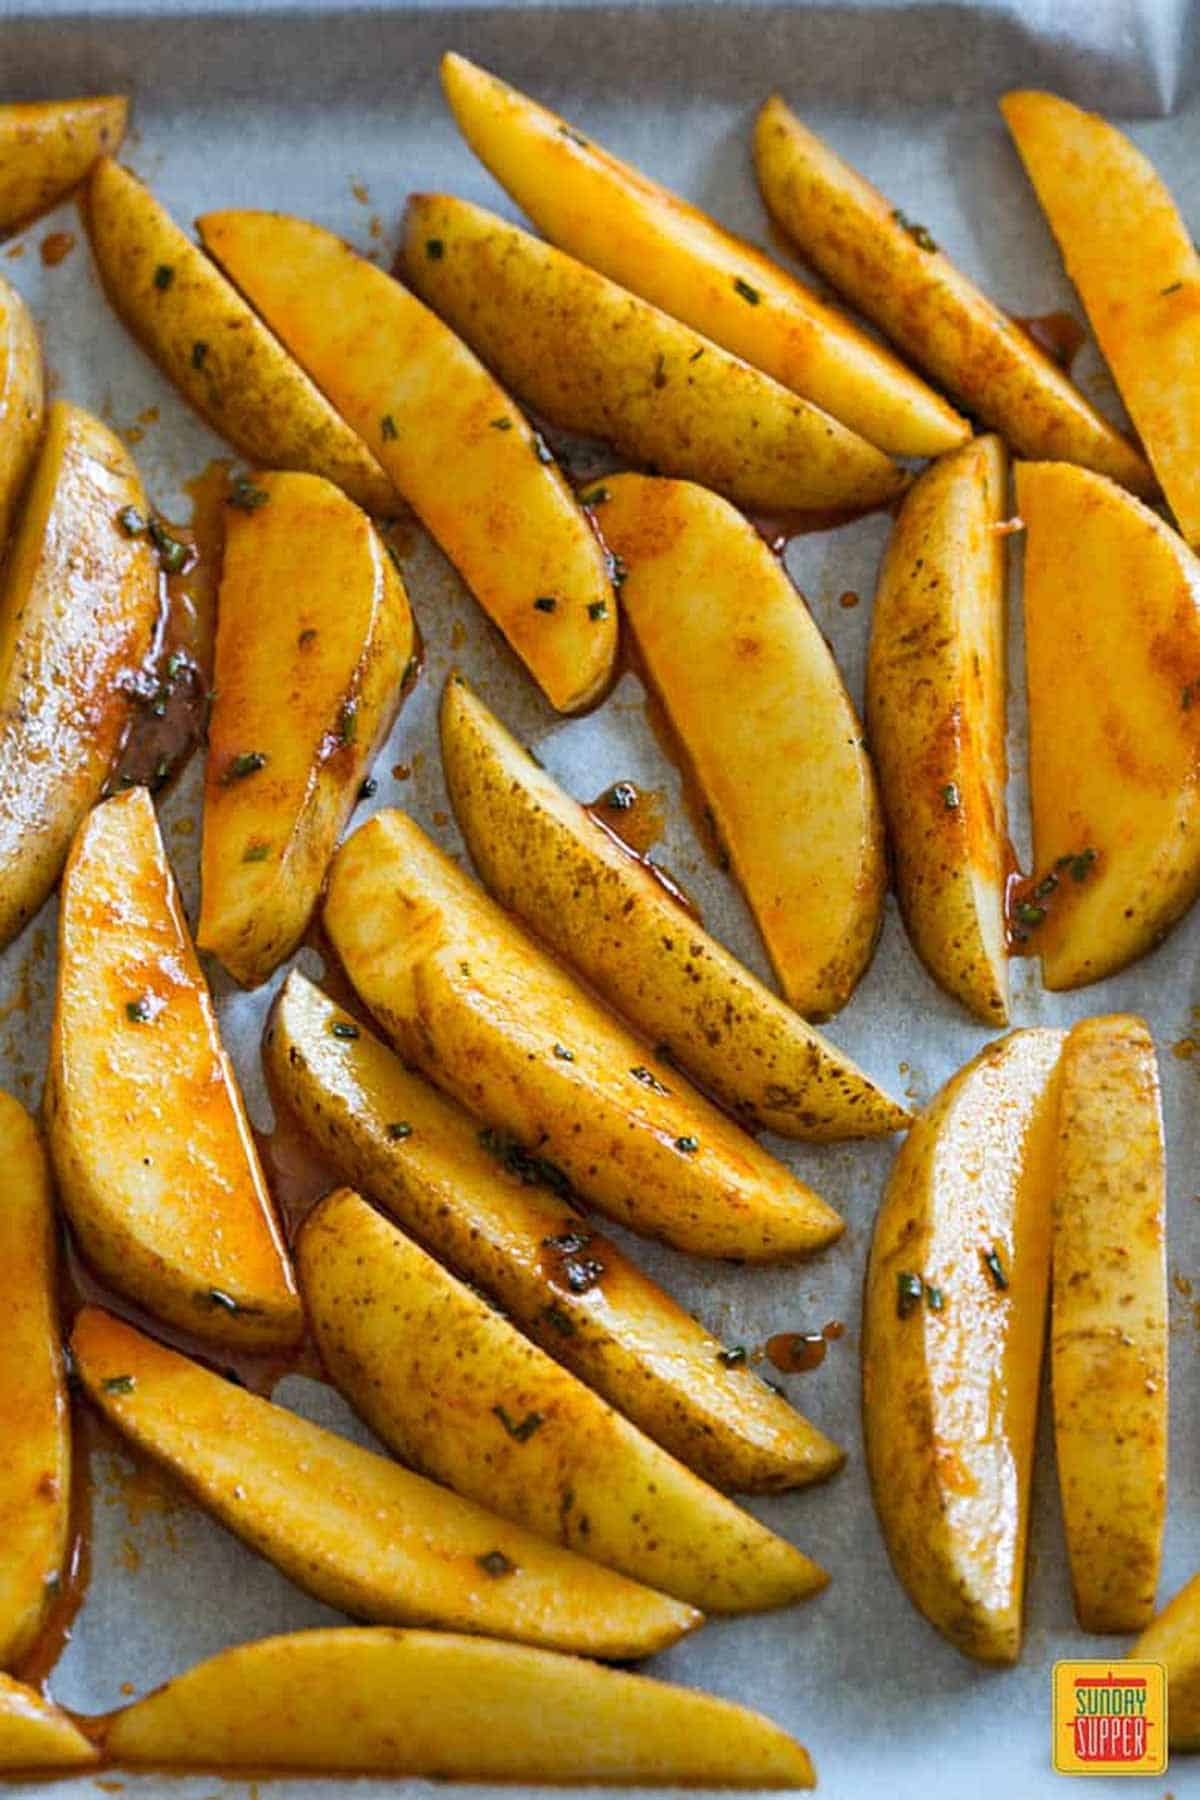 Unbaked potato wedges on a baking sheet